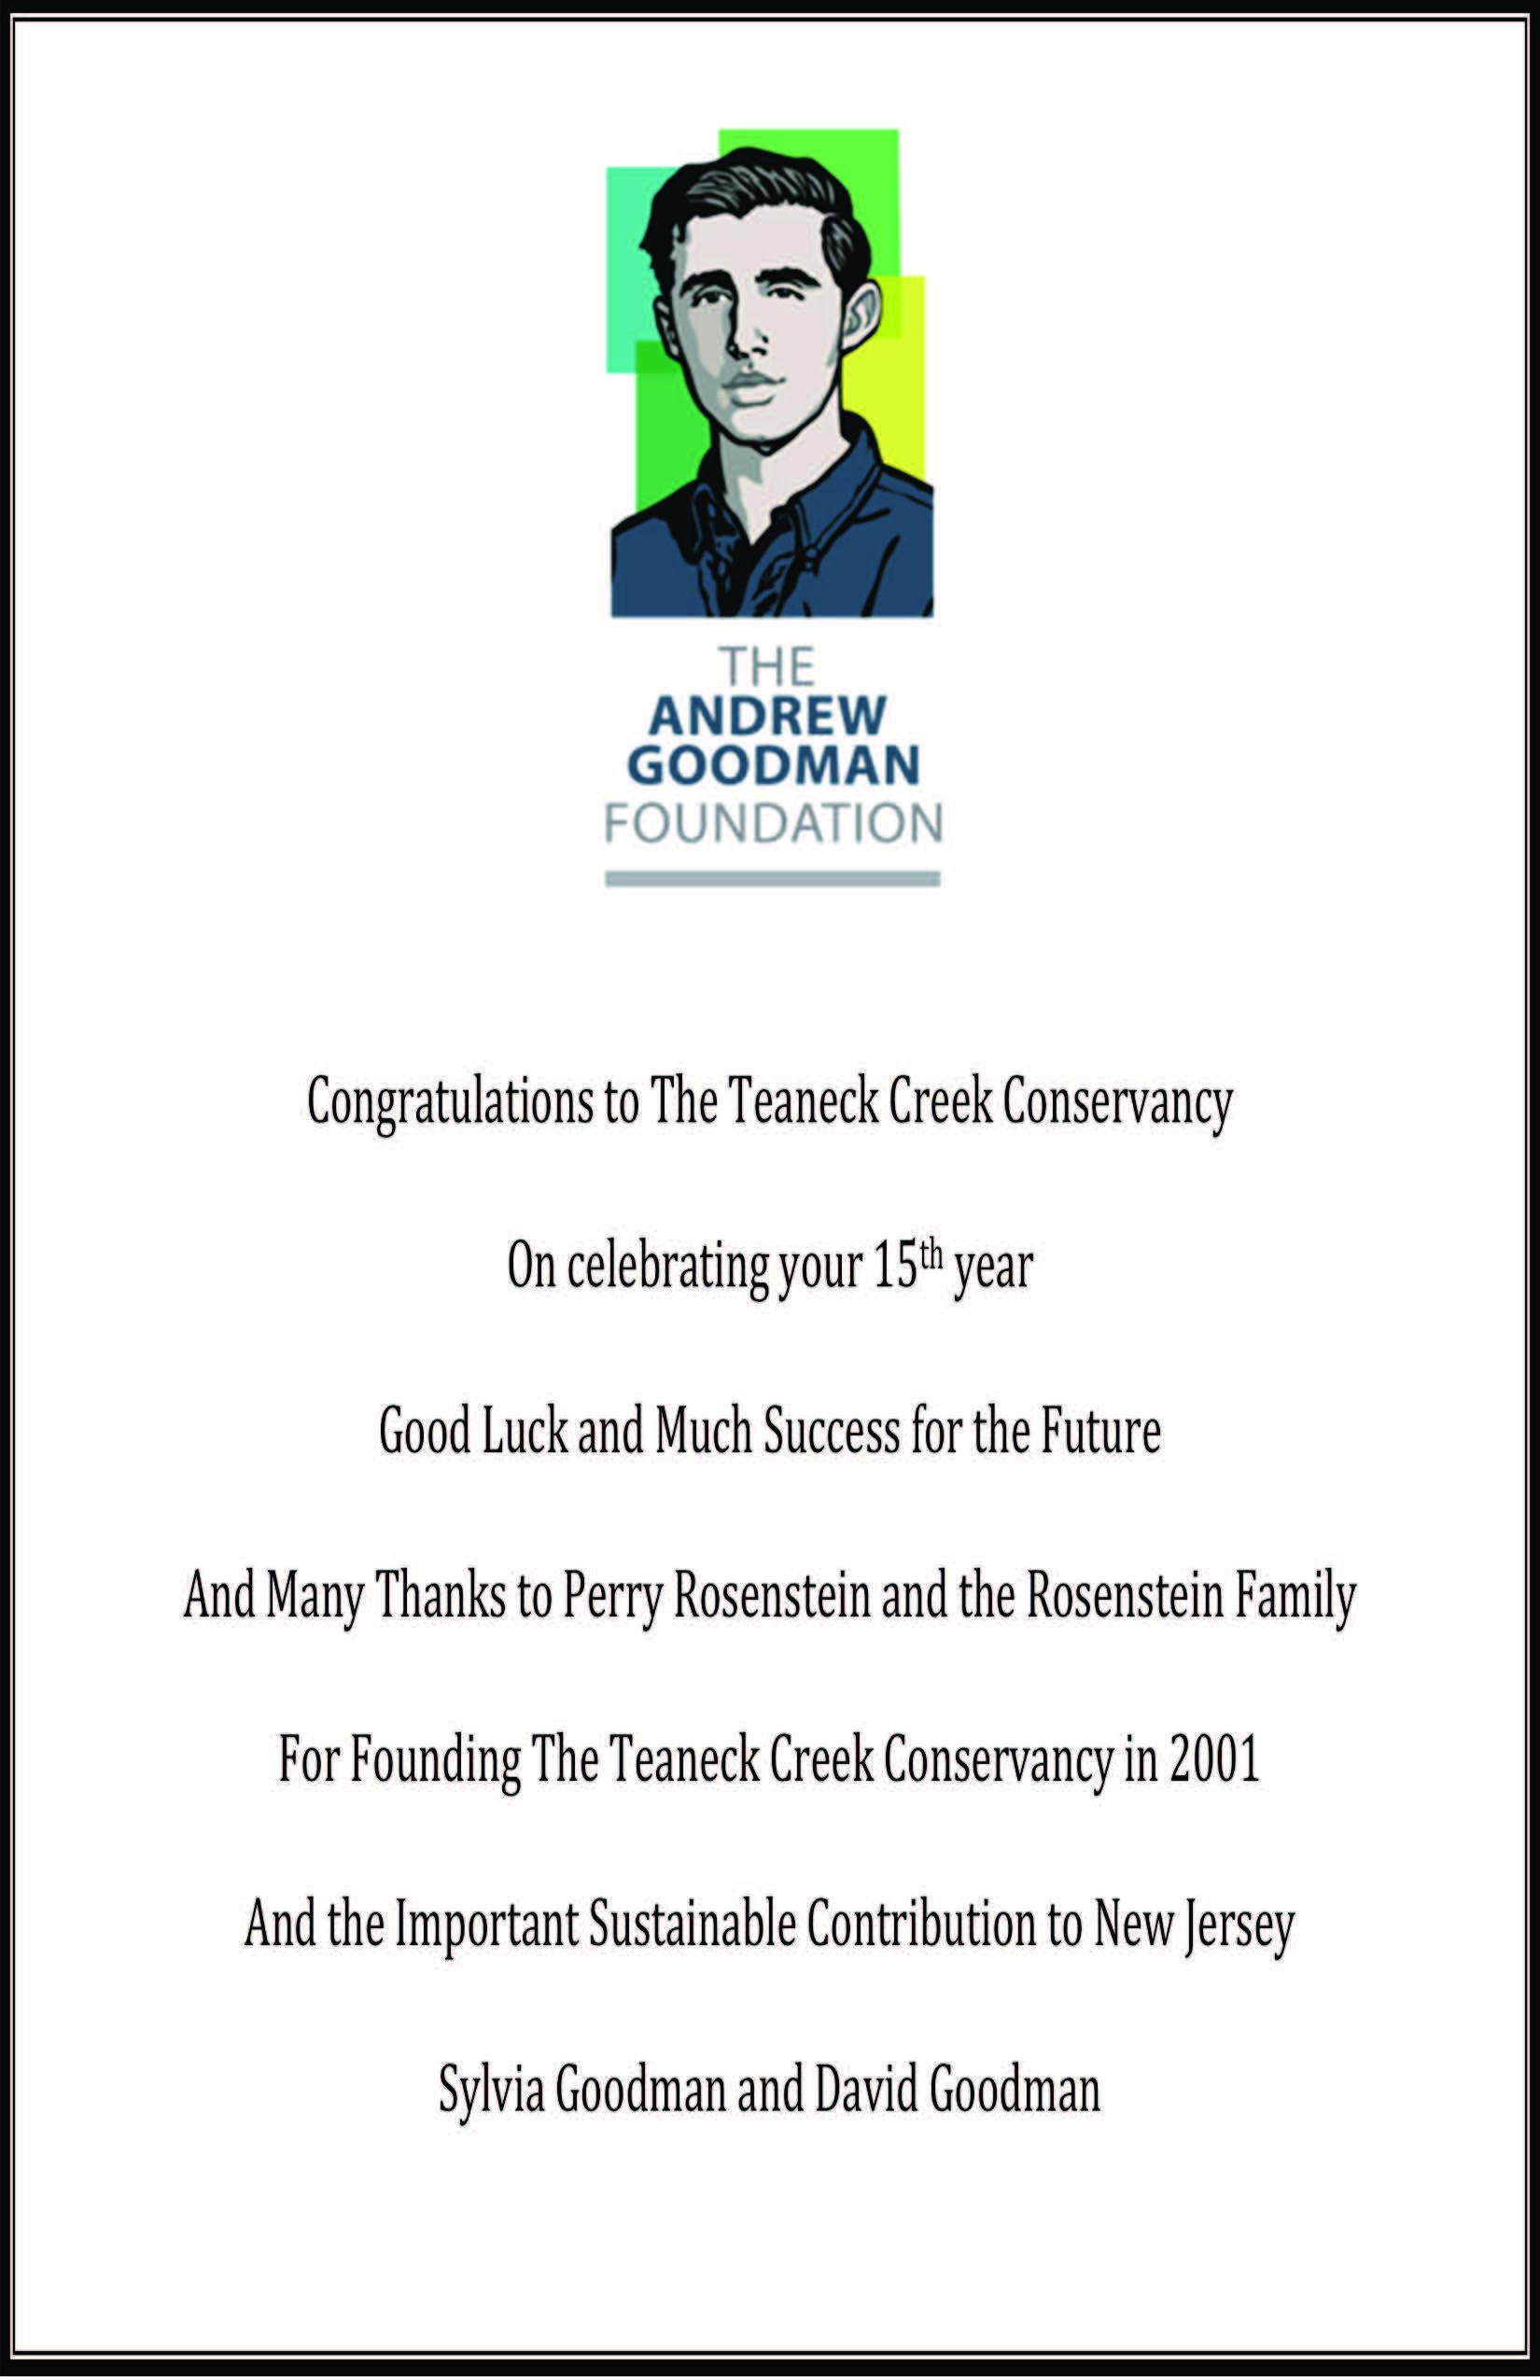 The Andrew Goodman Foundation